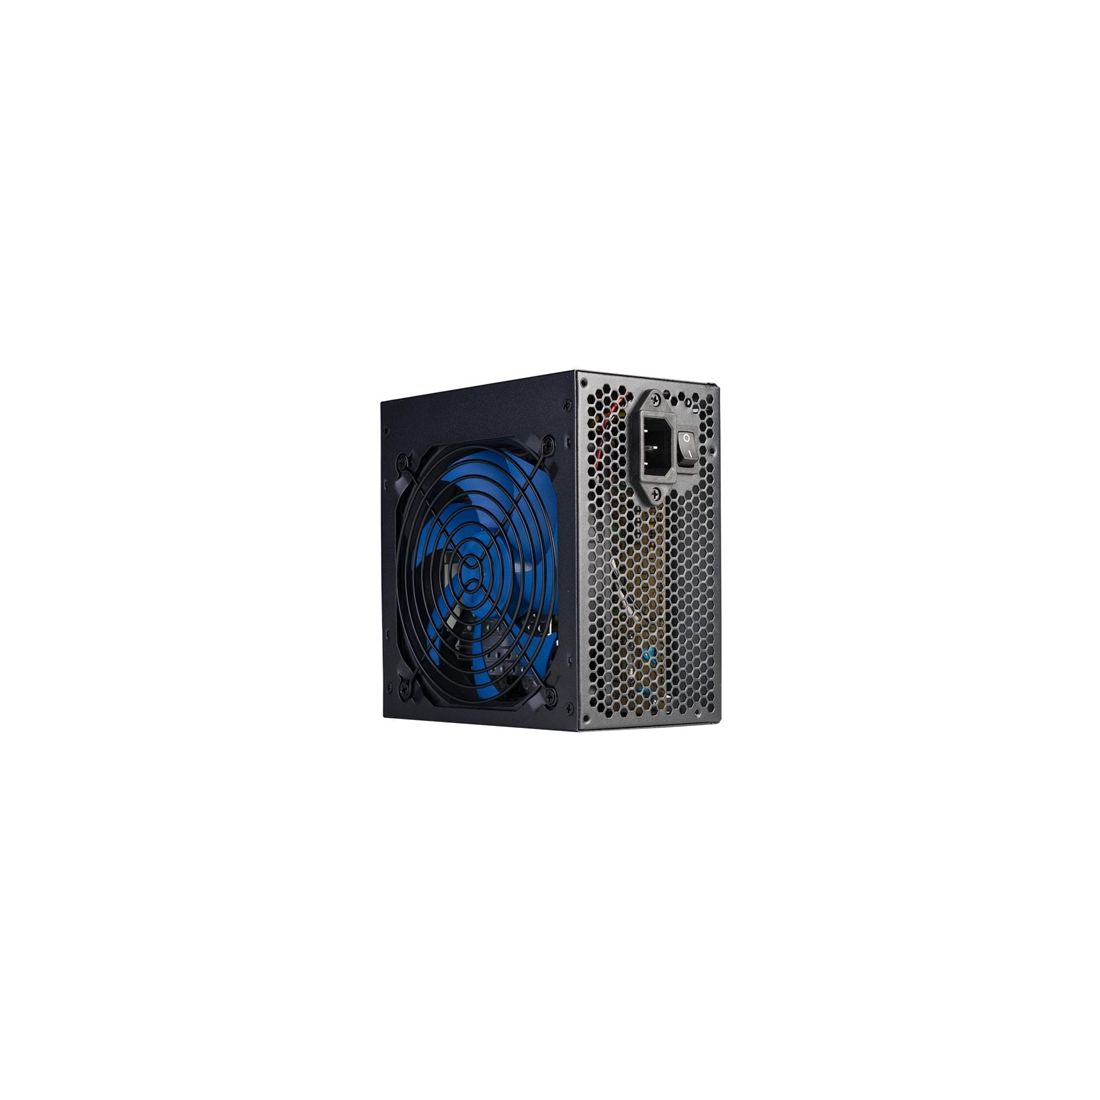 Hiditec Fuente AlSX 500W 60 Black 120mm fan